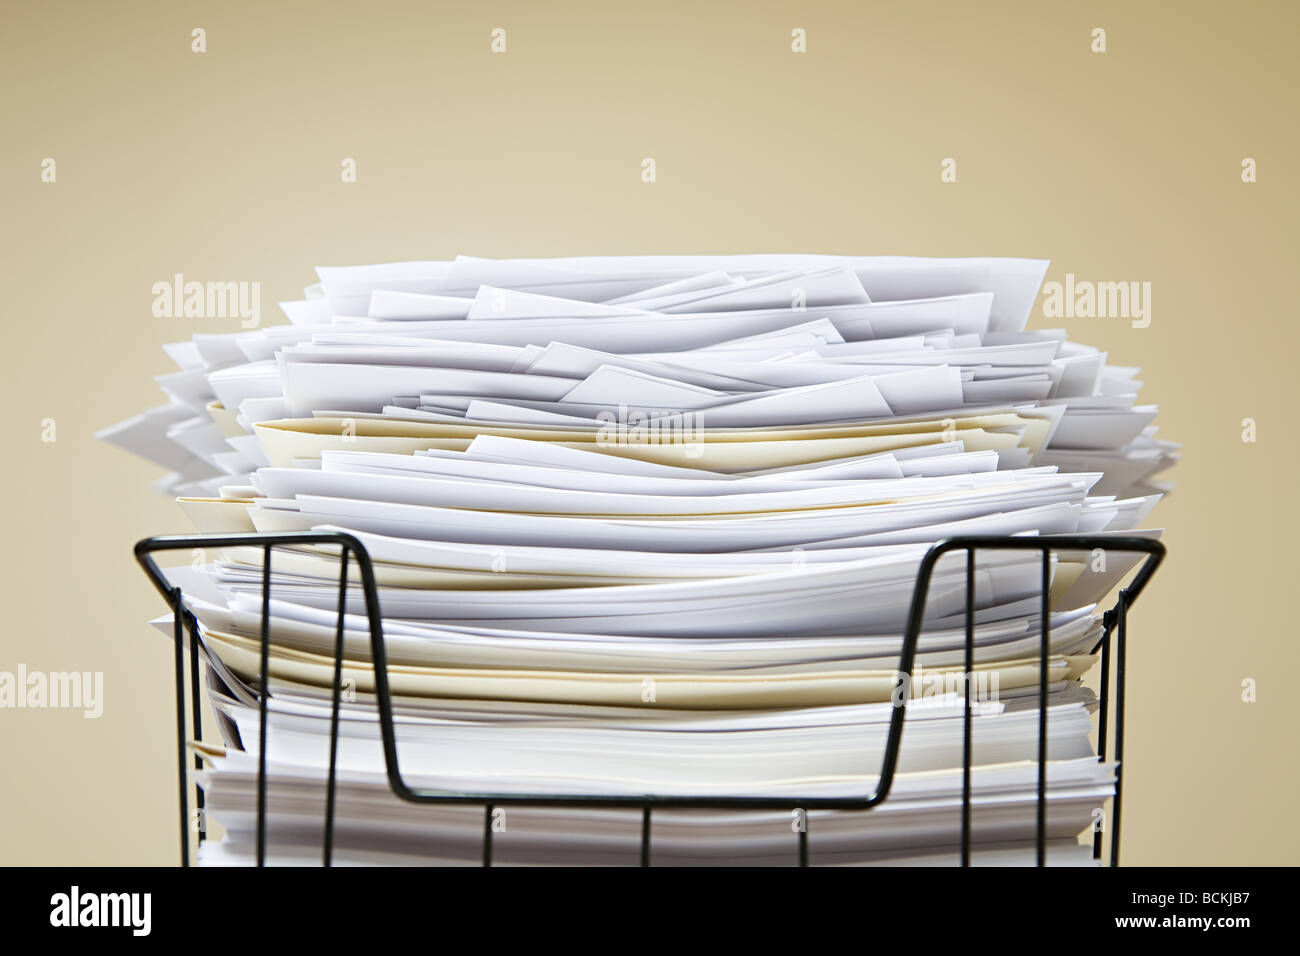 Overflowing inbox - Stock Image